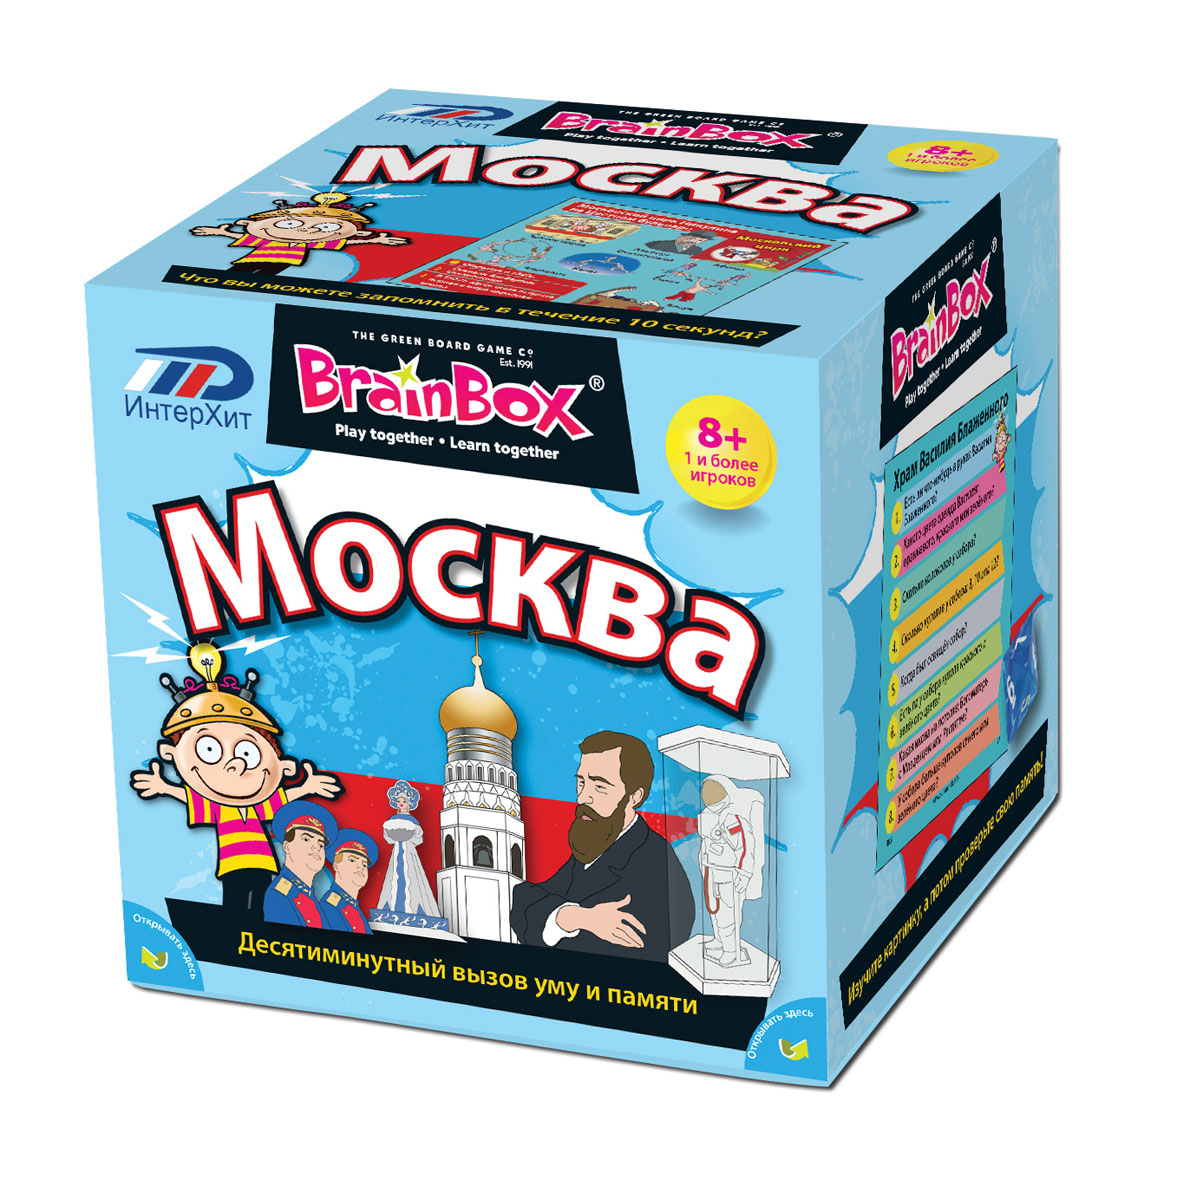 BrainBox Обучающая игра Сундучок знаний Москва сундучок знаний настольная игра сундучок знаний мир динозавров brainbox